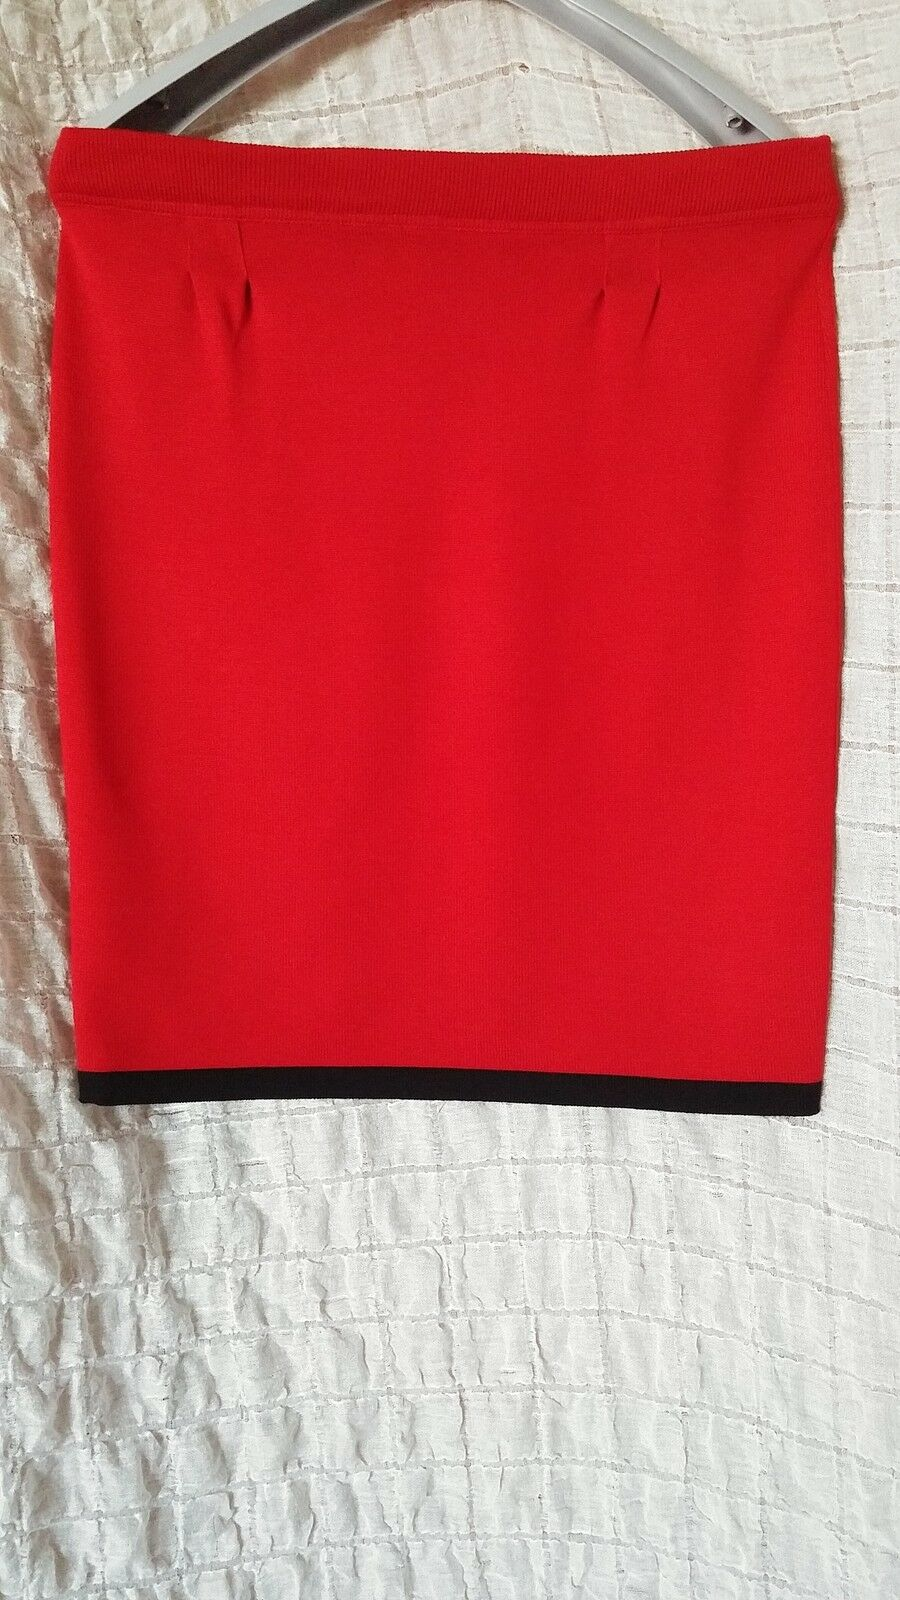 Escada Margaretha Ley red 100% wool knitted pencil straight skirt size 42 (L-XL)